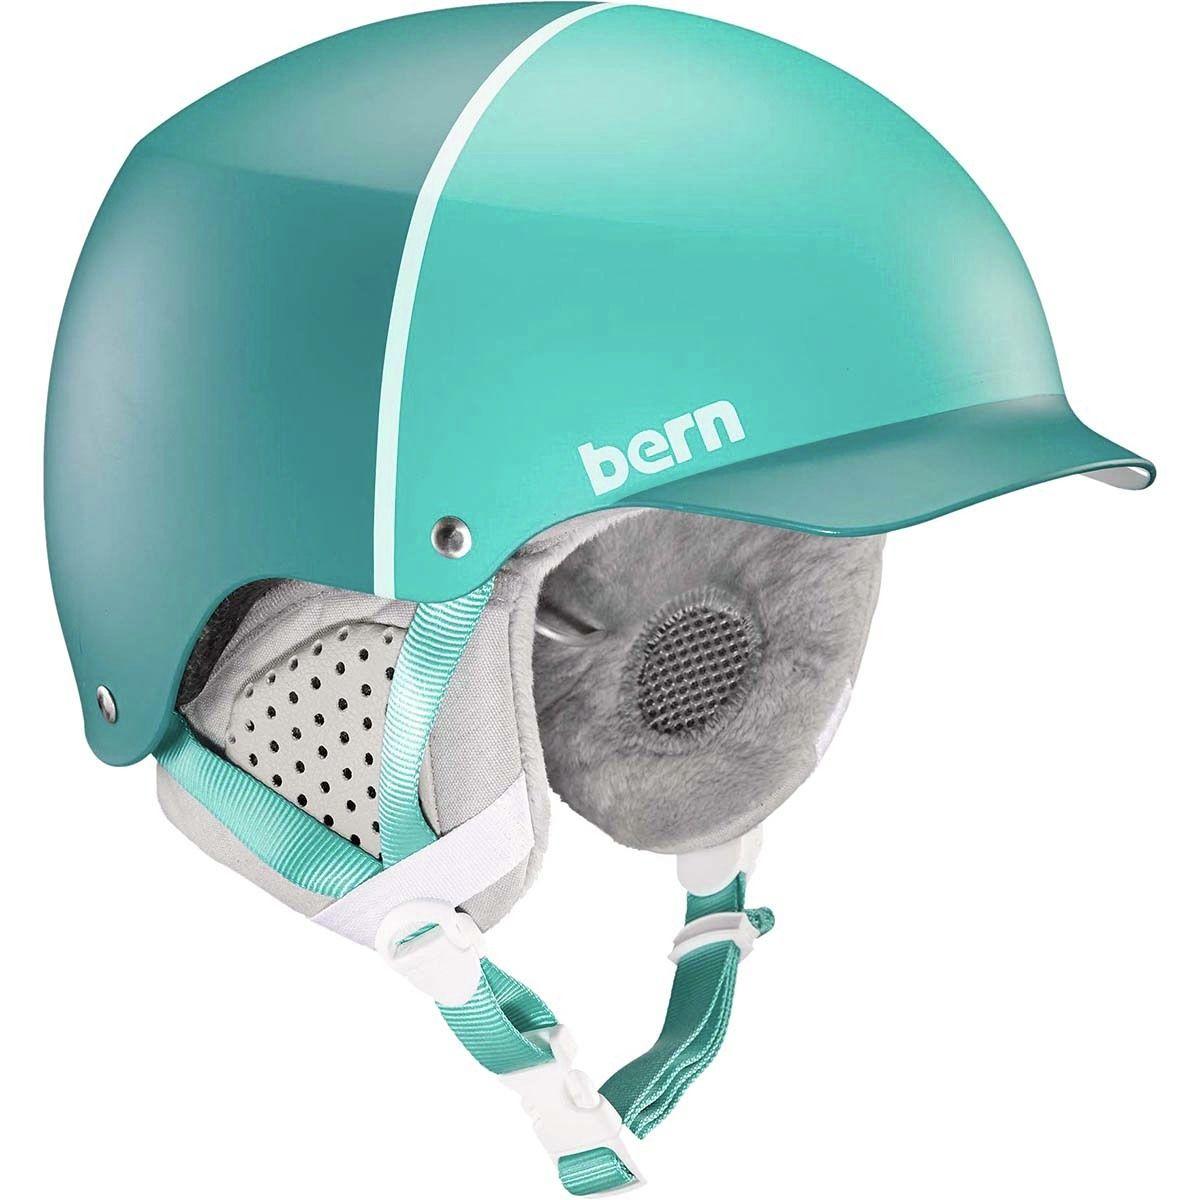 Bern Muse